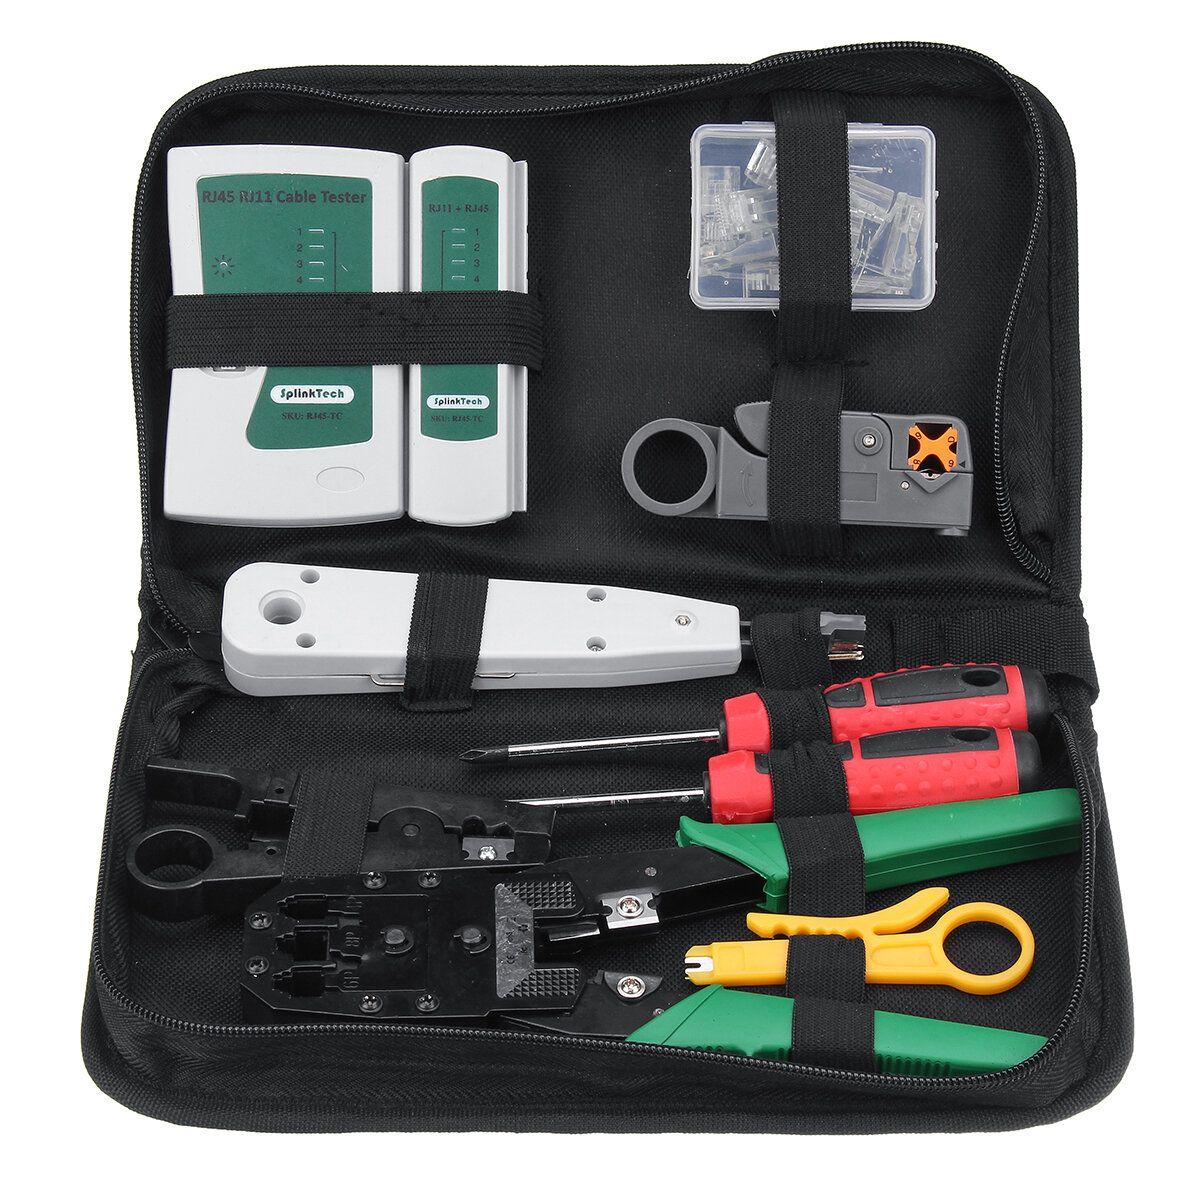 LAN Network Cable Tester Crimp Crimper Plier Kit Cat5 RJ45 RJ11 RJ45 Hand Tool